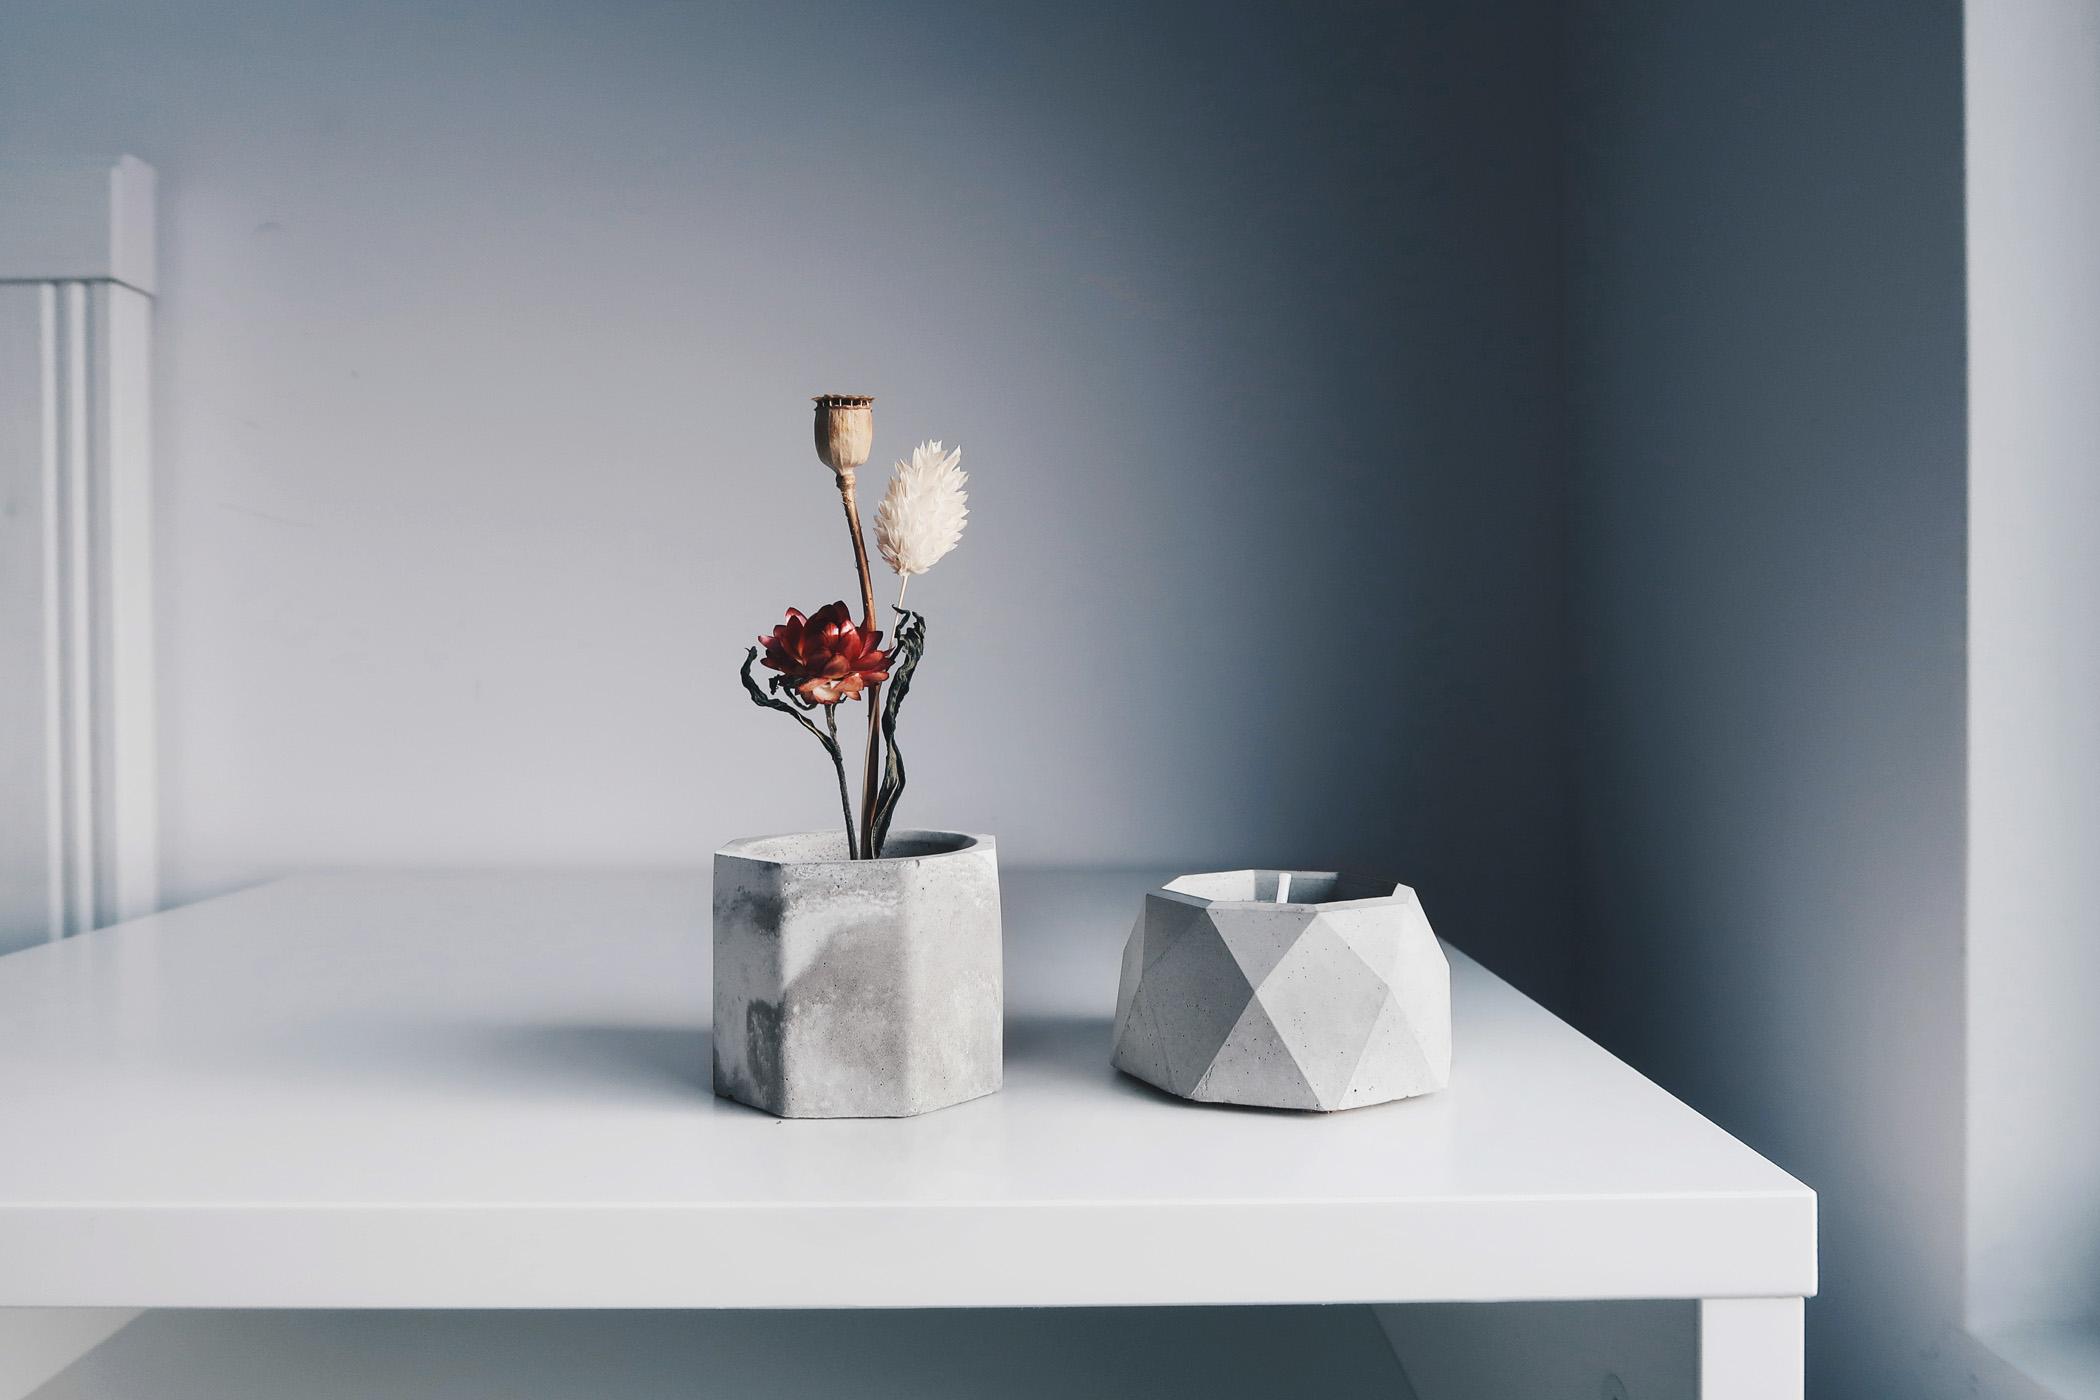 BLOOMING 綻放-水泥銅座盆器・線香燭台・收納盤